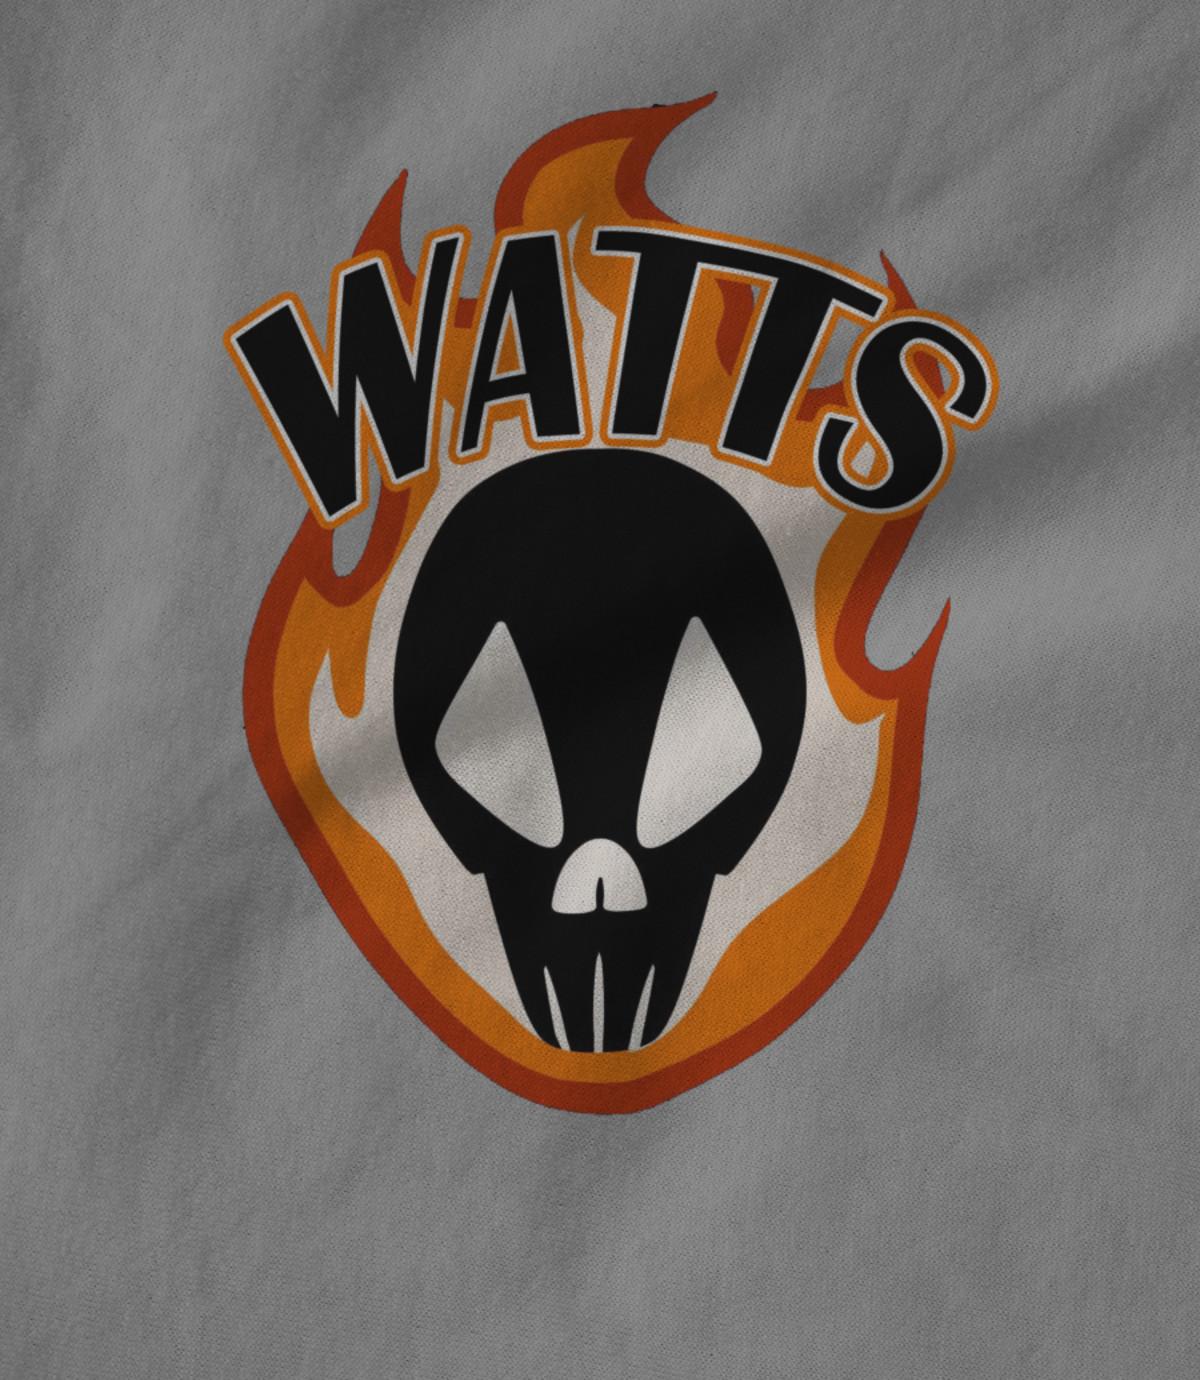 Hogtown pro wrestling watts orange flame 1479163796